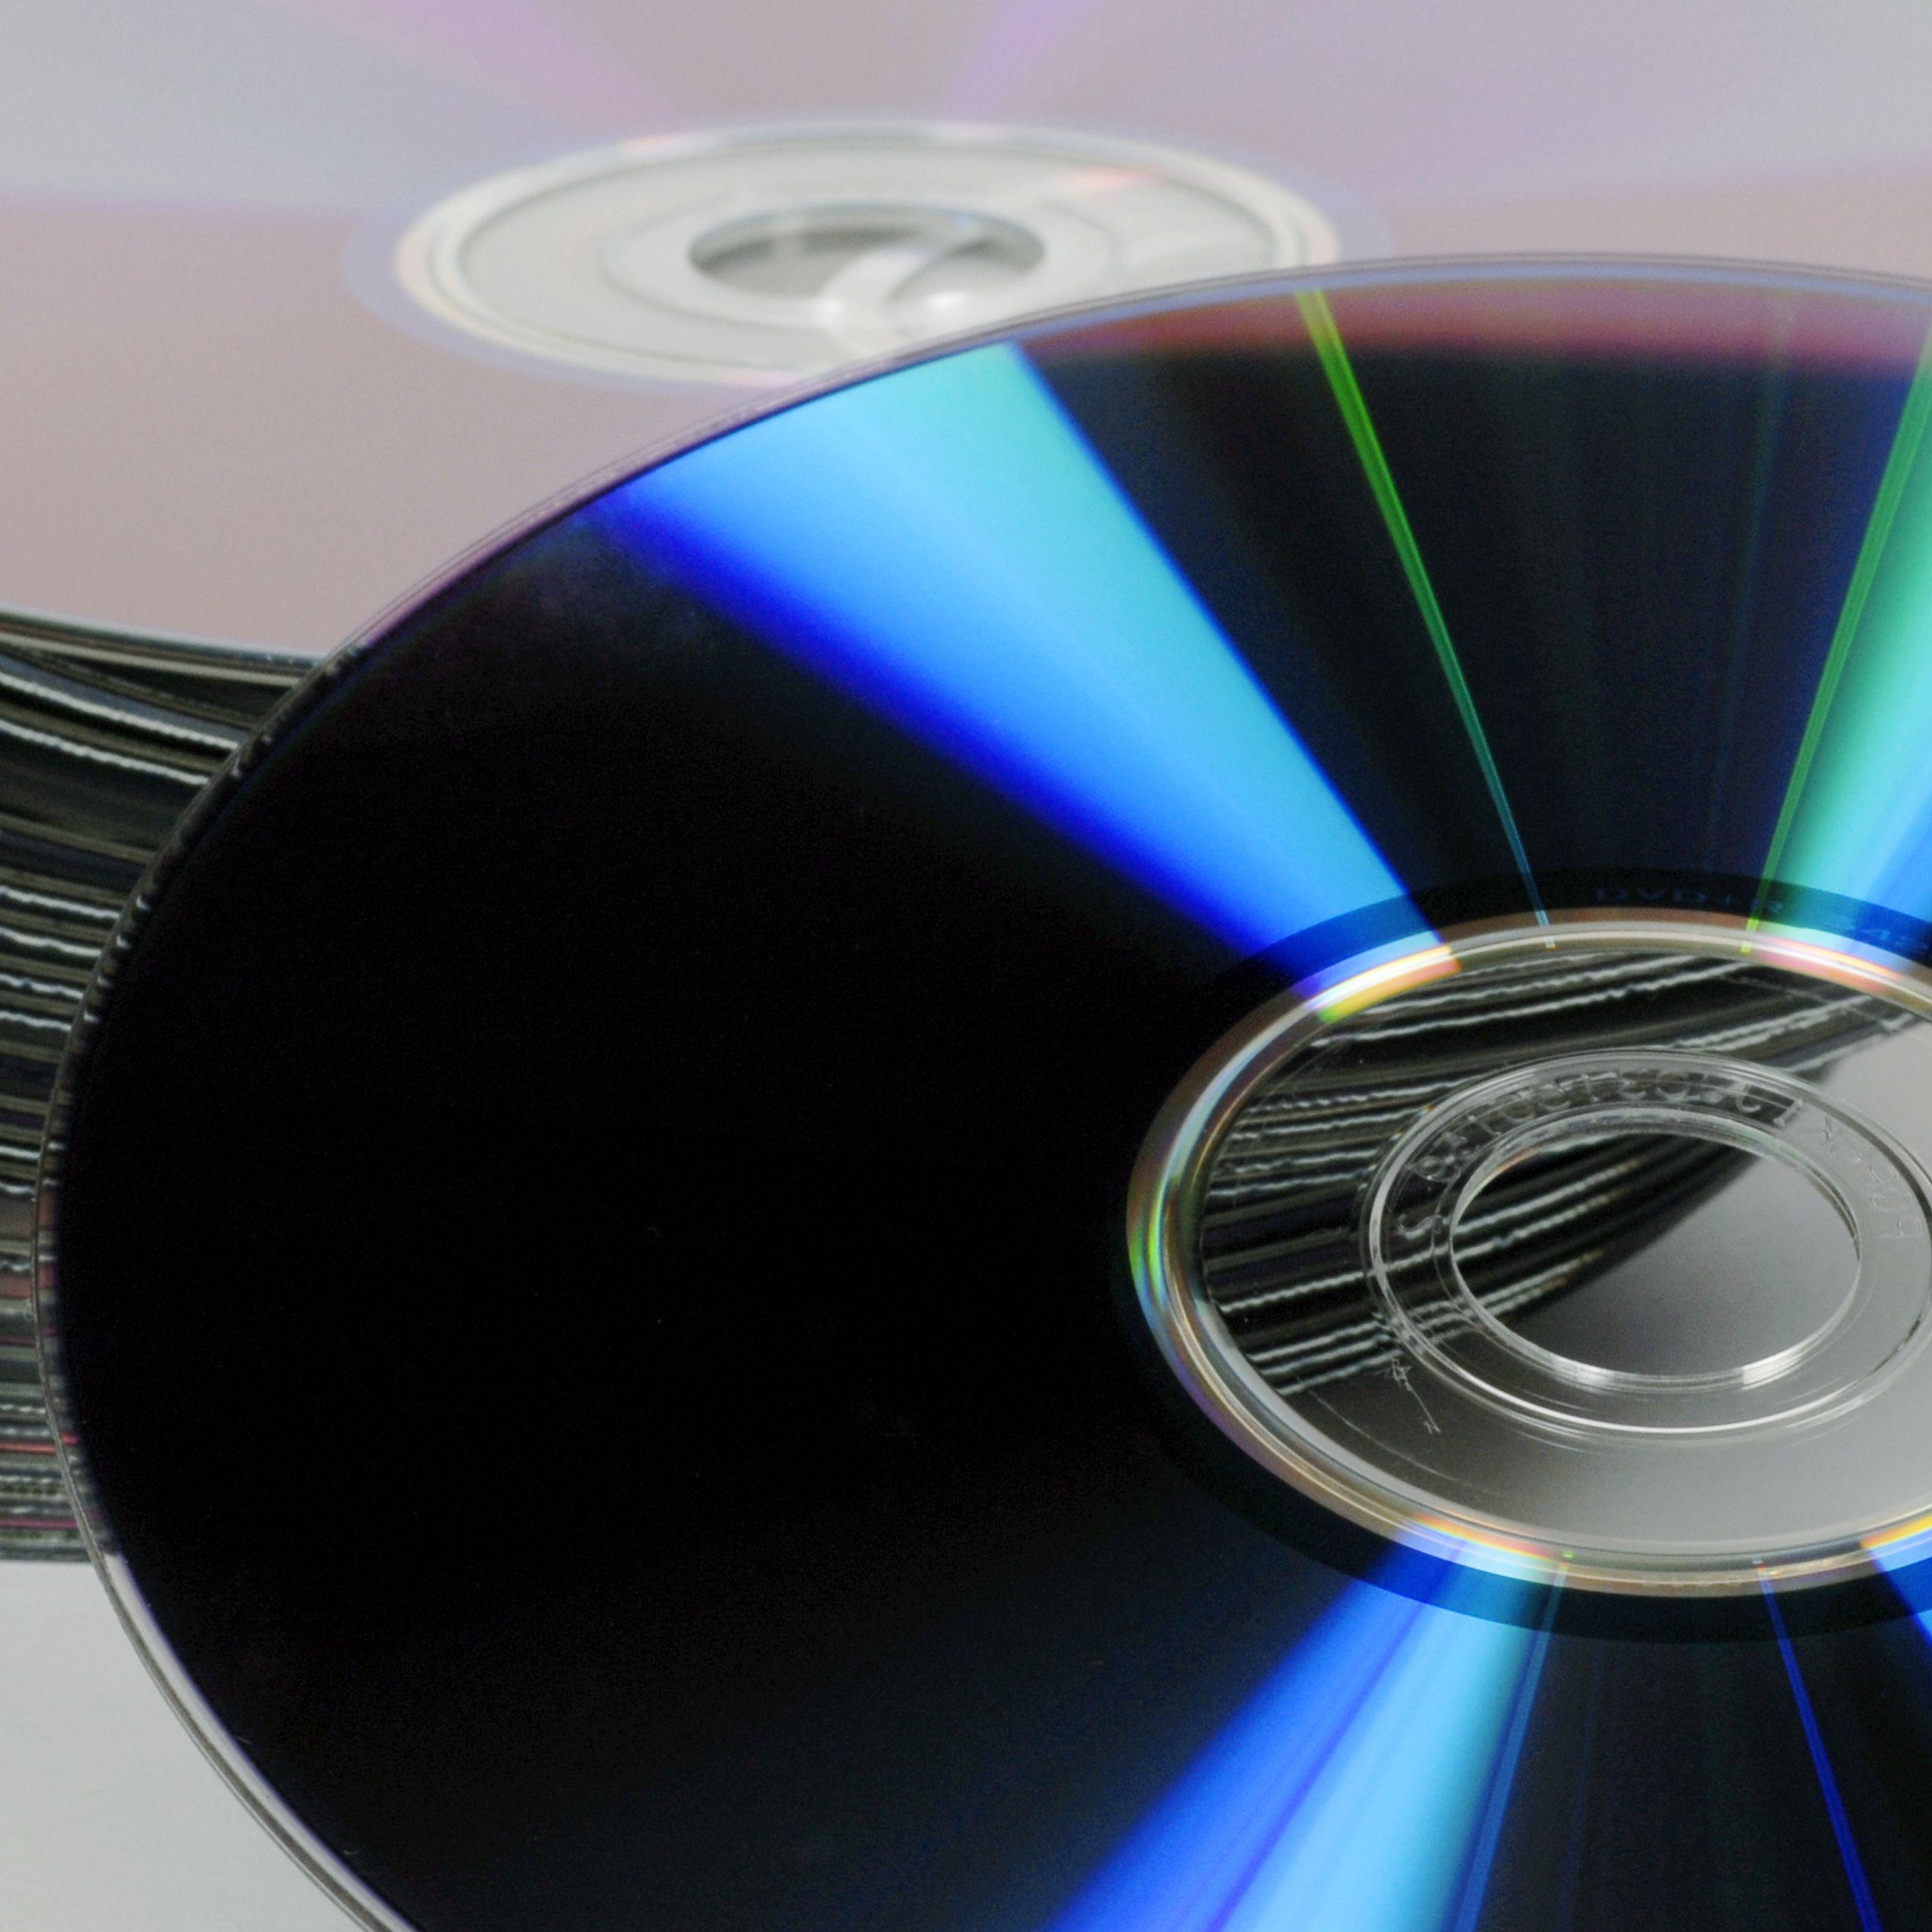 can my pc burn cds